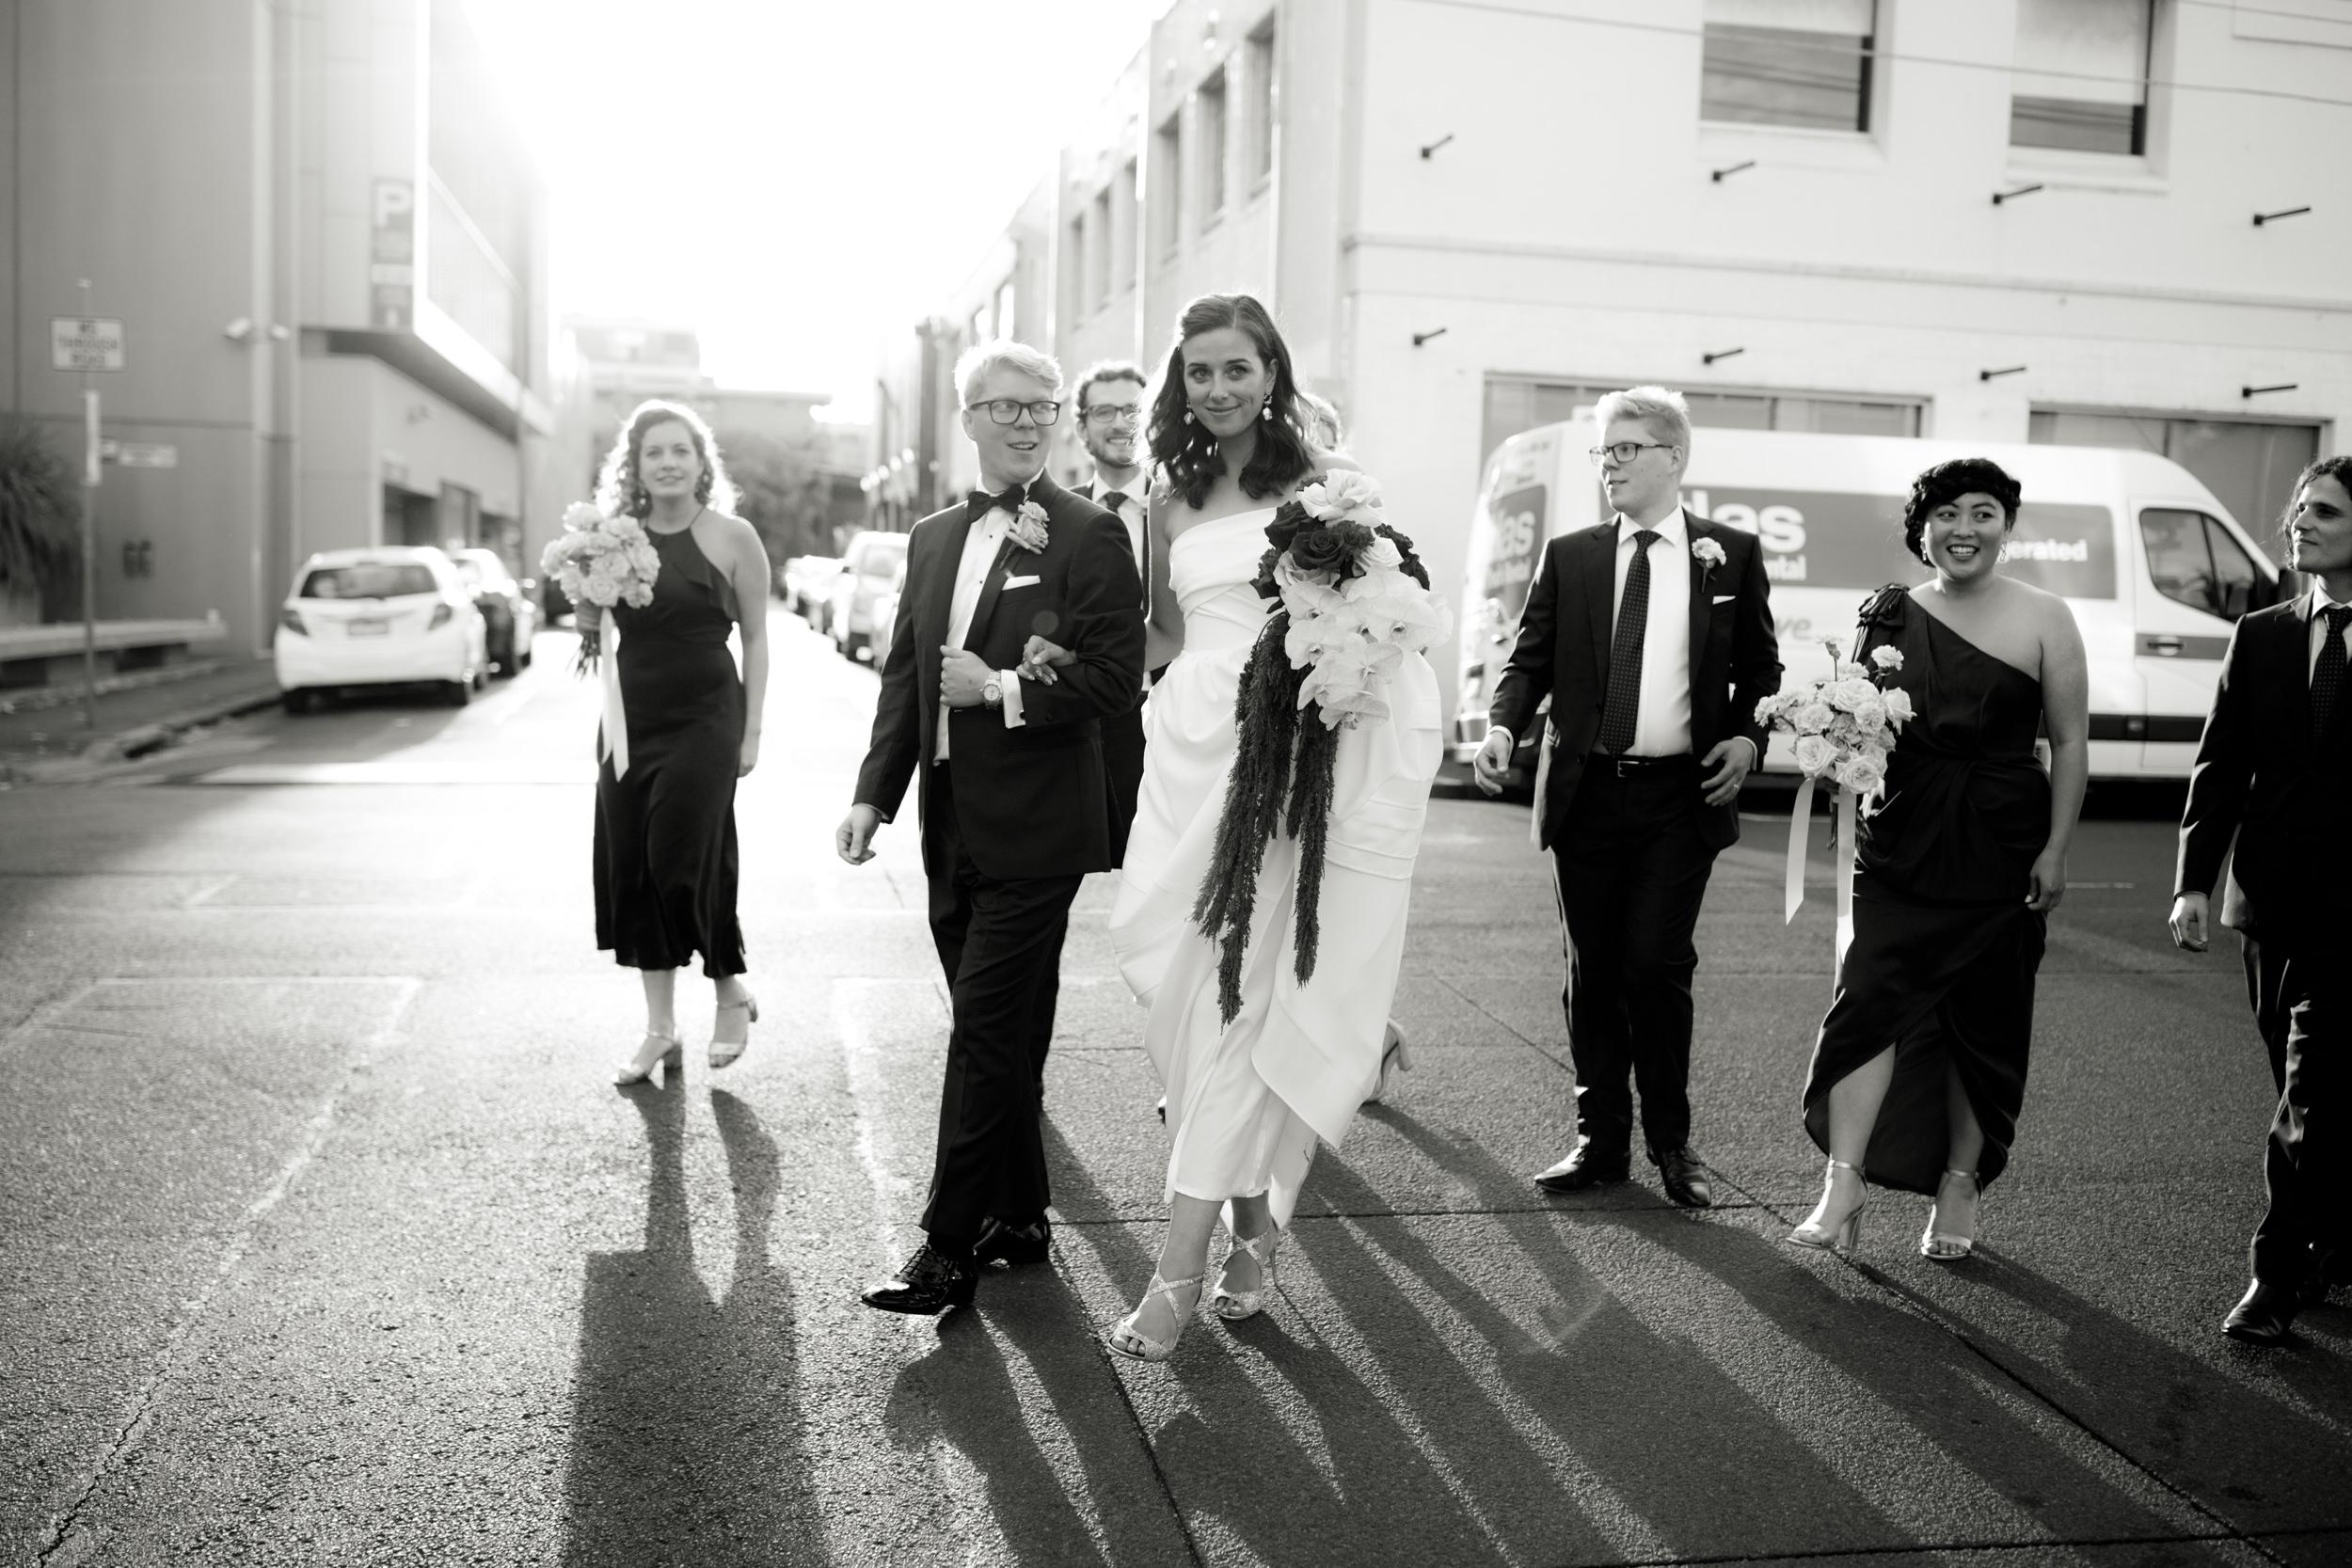 I-Got-You-Babe-Weddings-Tahlia&Mitch-Butler-Lane-Wedding0157.JPG